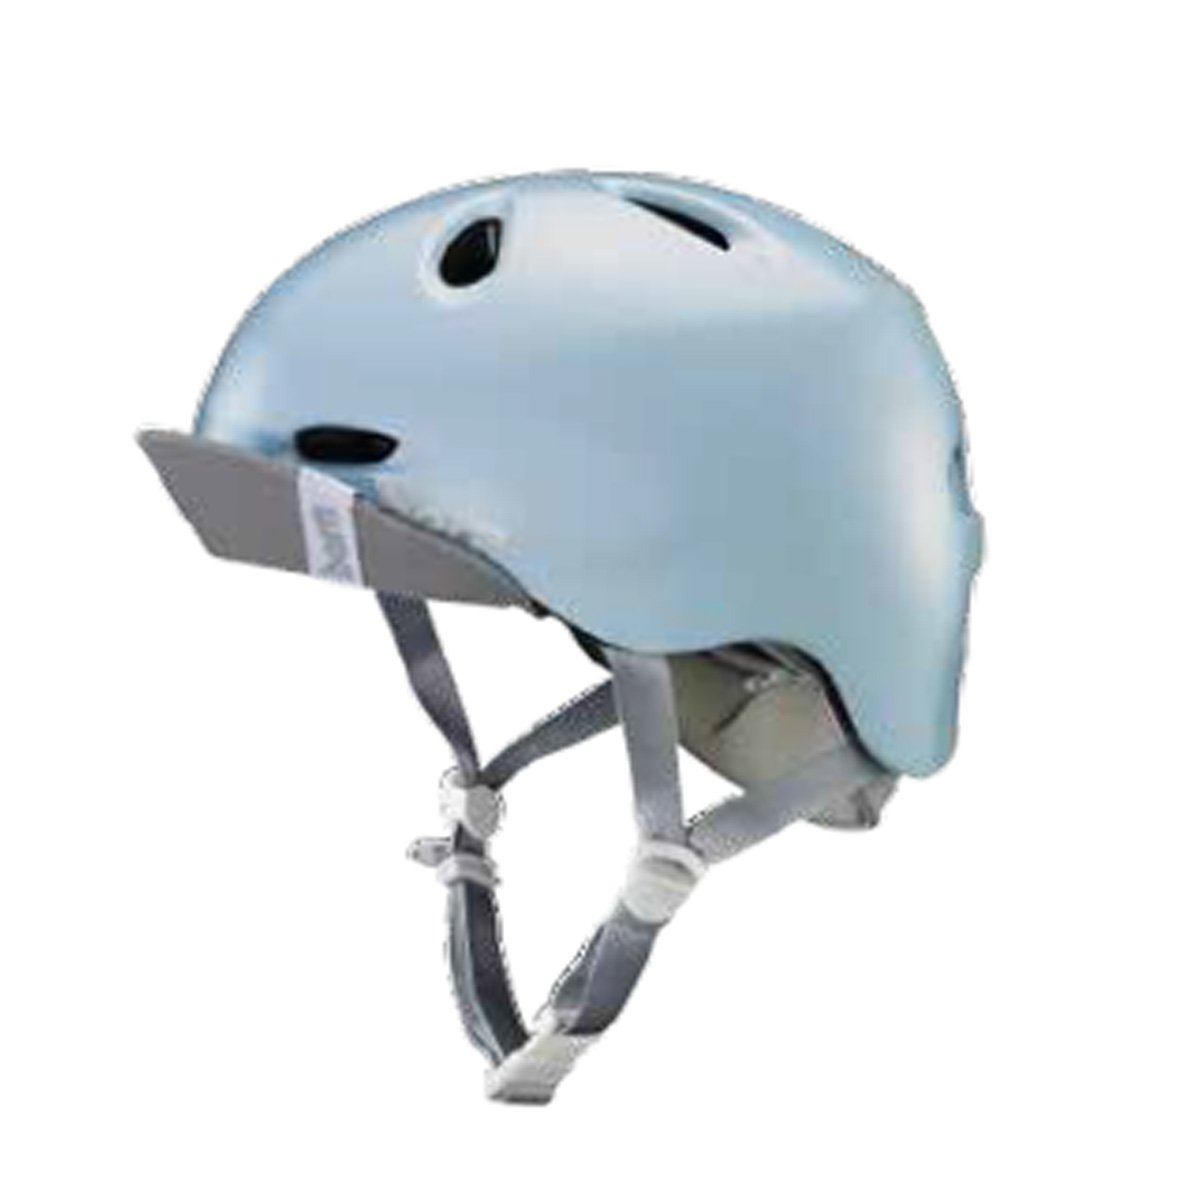 Bern Damen Berkeley with Flip Visor Fahrrad Helm